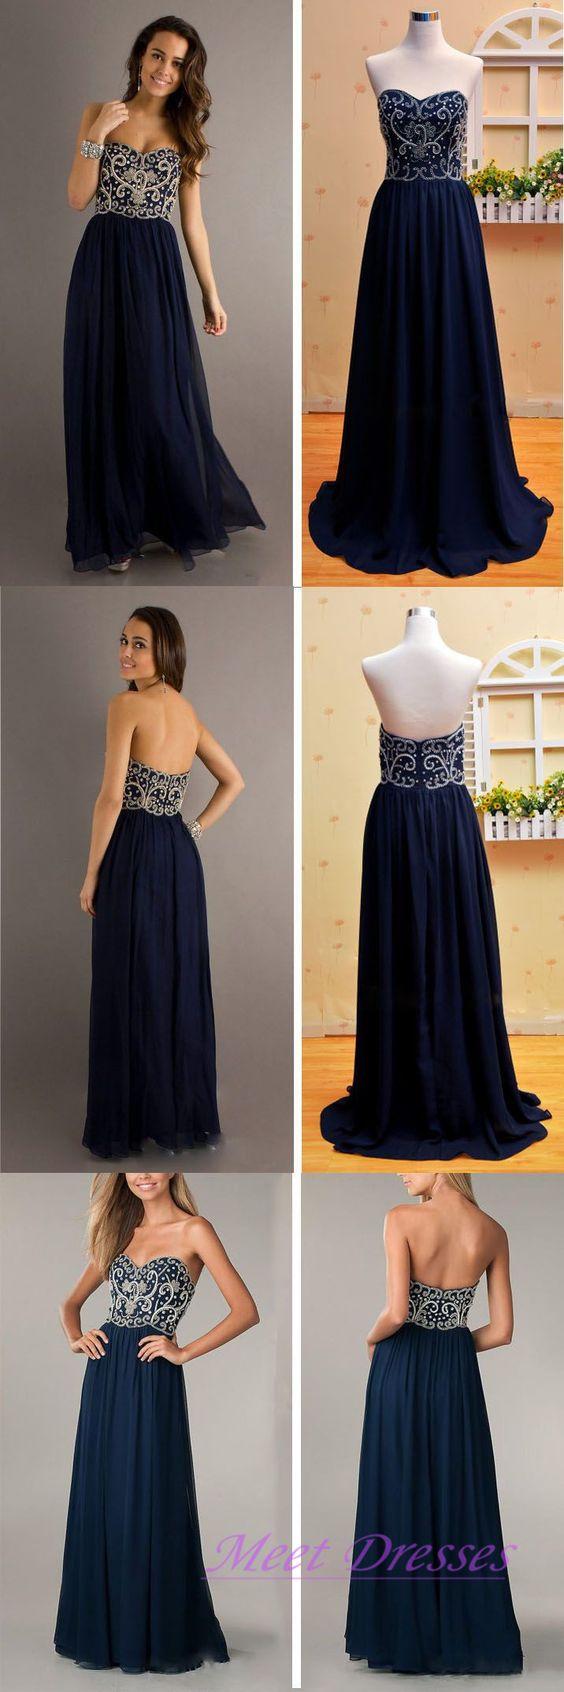 Navy Blue Prom Dresses New Style Beaded Bodice Sweetheart Neckline Chiffon Long…